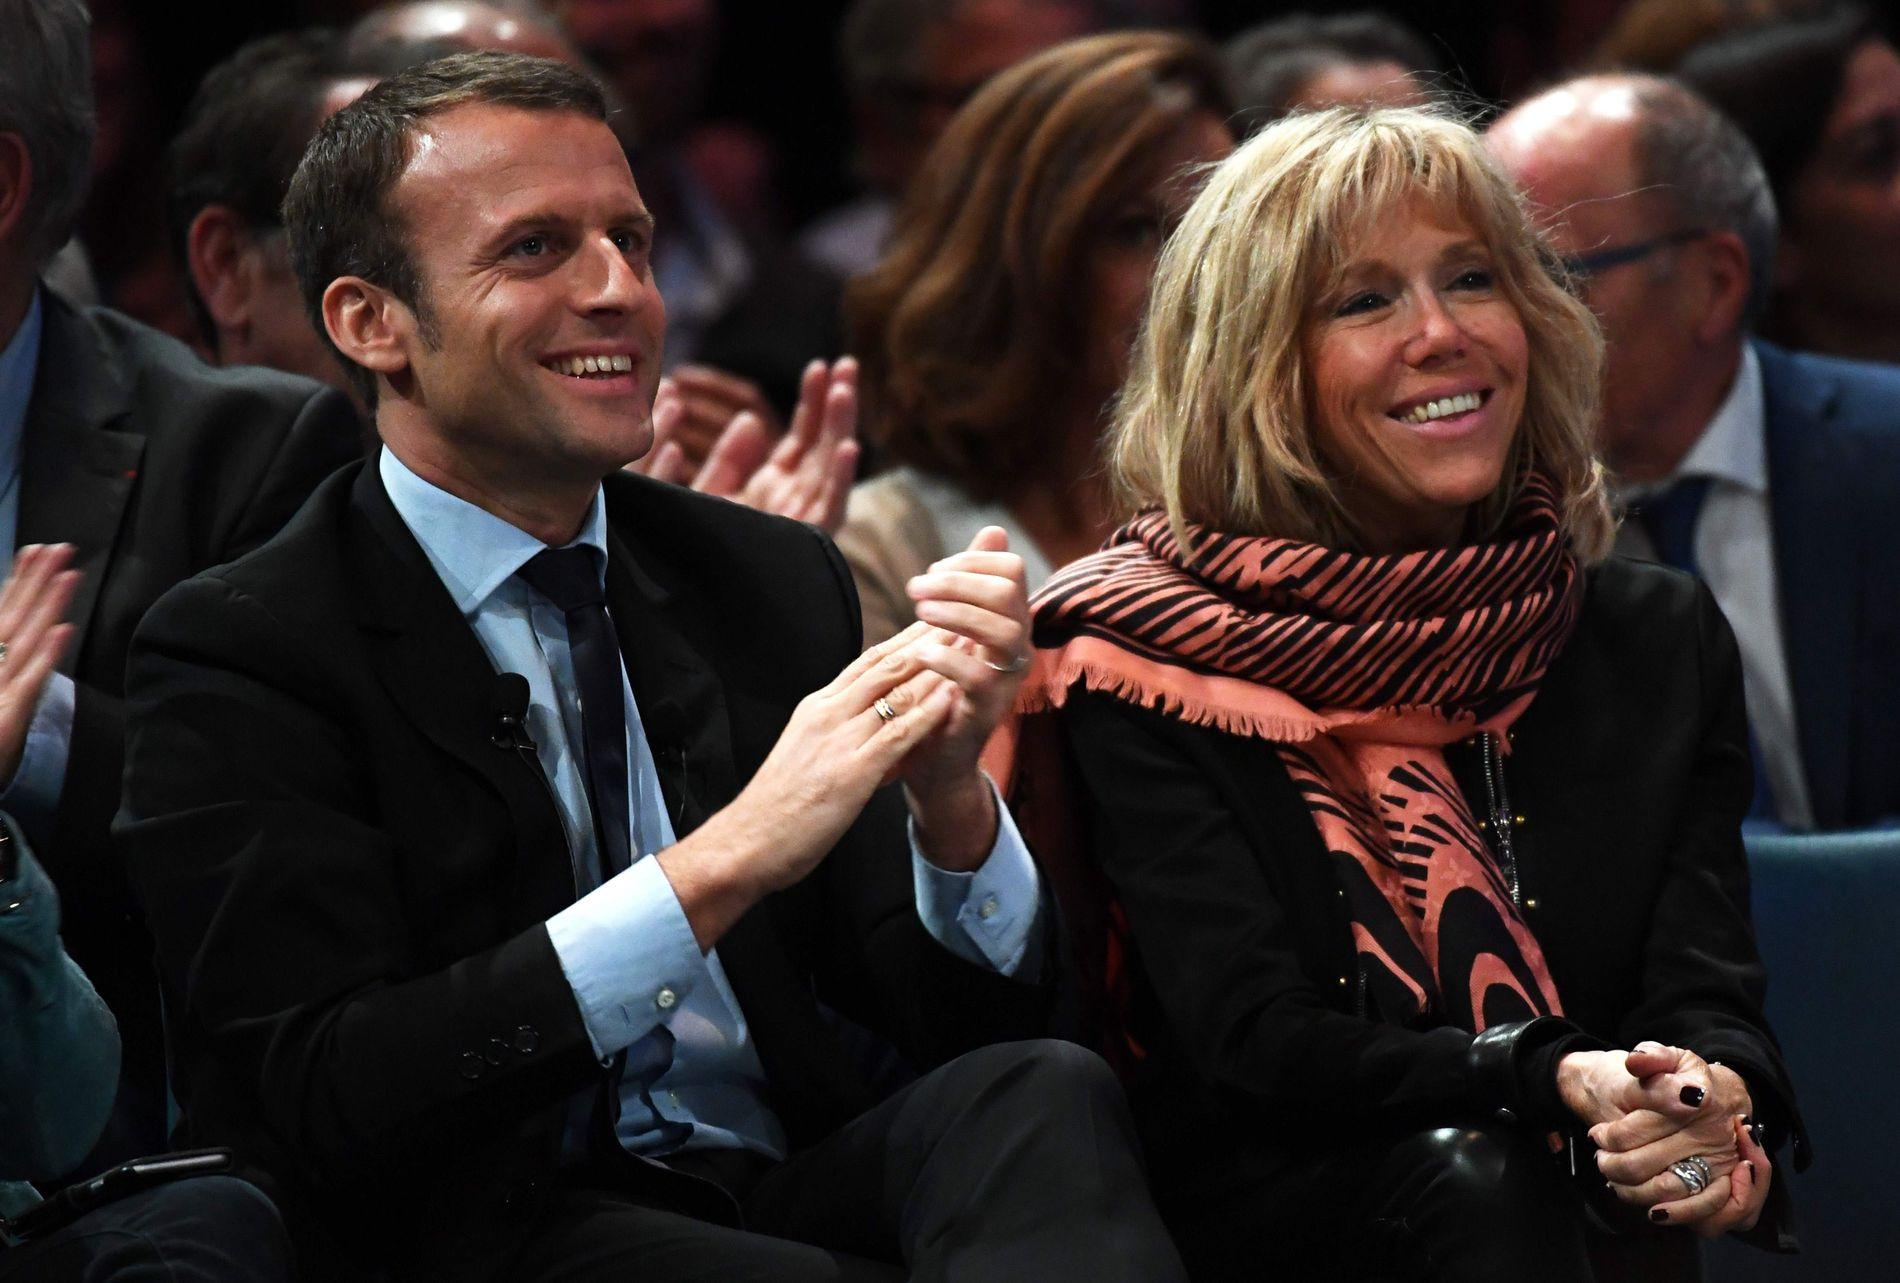 FORELSKA I LÆRER´N: Den uavhengige kandidaten Emmanuel Macron er valgkampens yngstemann og sees på som et moderne friskt pust inn i fransk politikk. Han er gift med sin tidligere lærerinne, 21 år eldre Brigitte Trogneux. FOTO: AFP